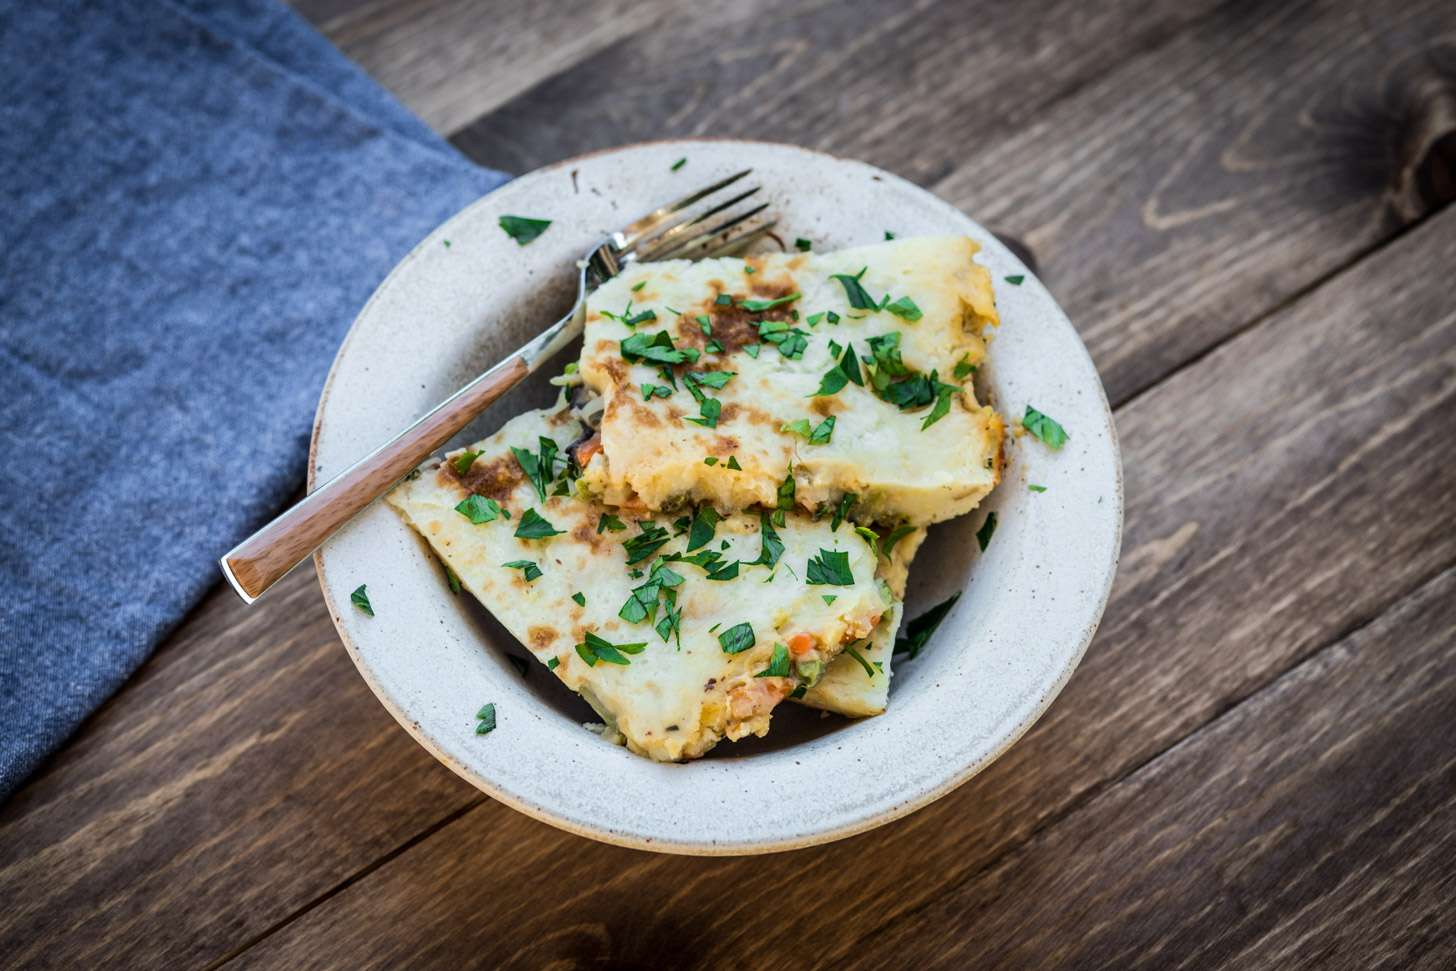 Creamy vegetarian shepherd's pie recipe